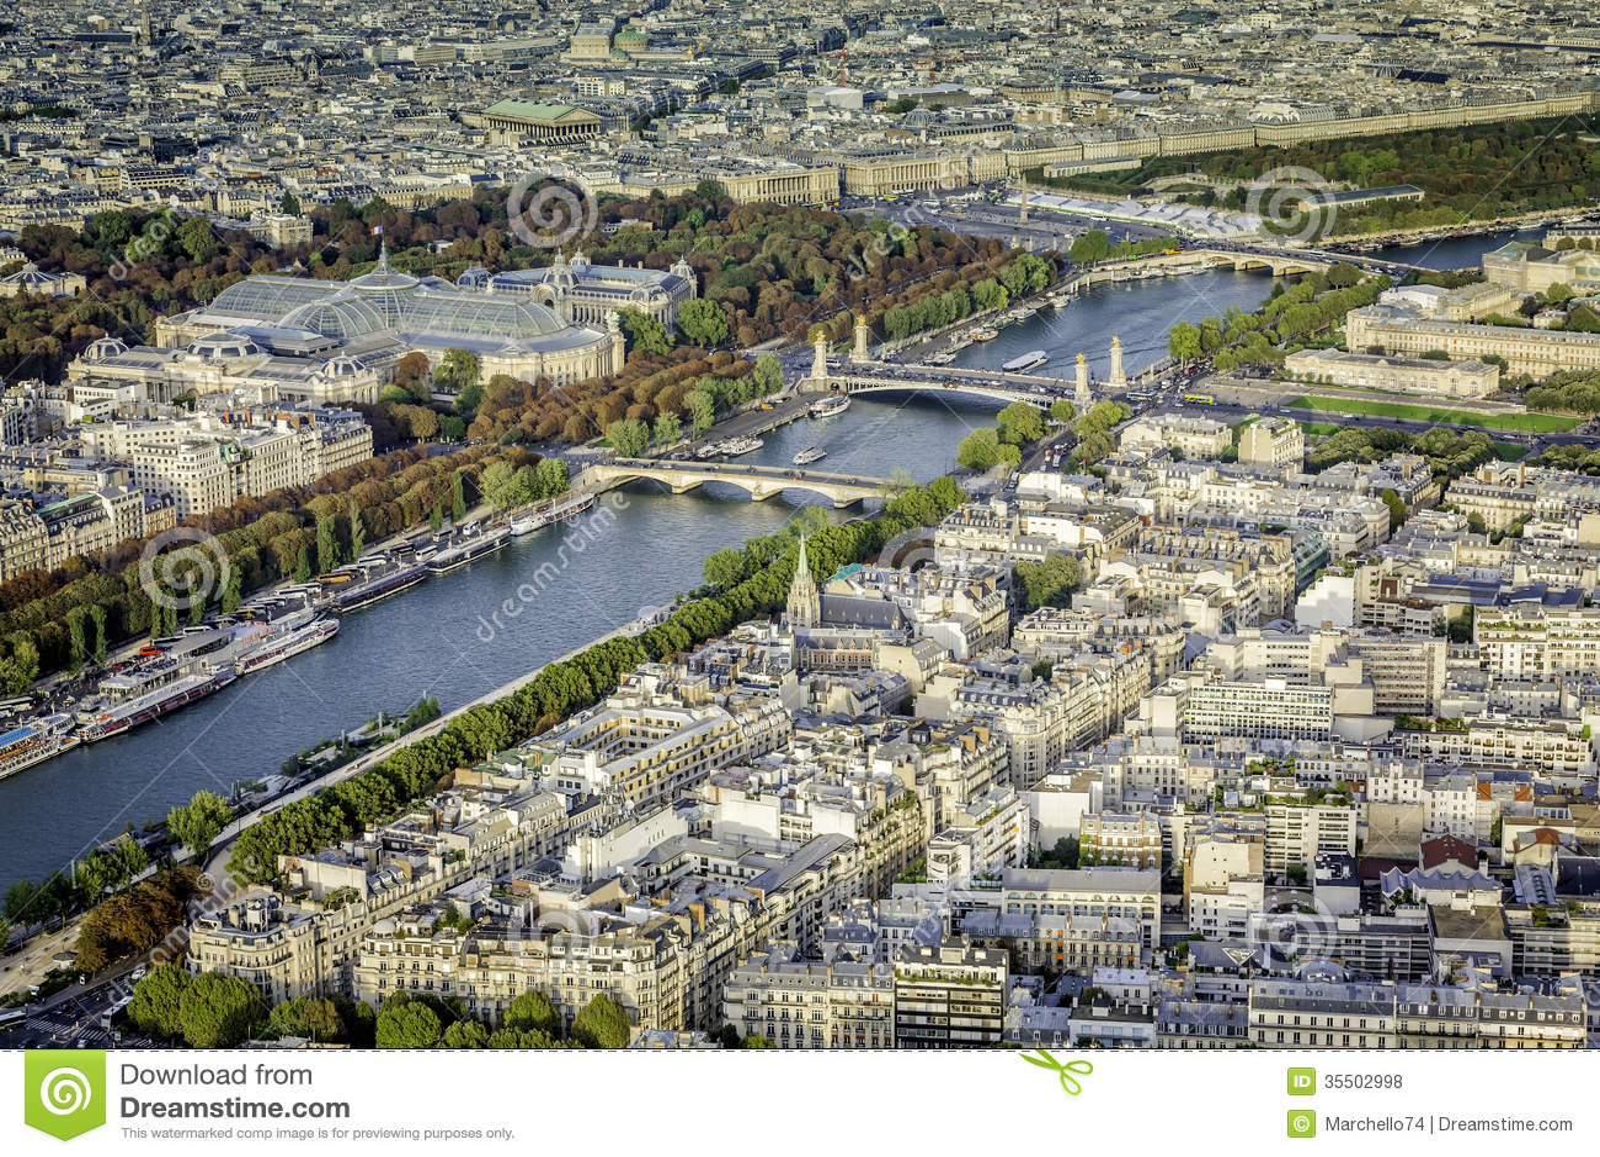 The Grand Tour European History